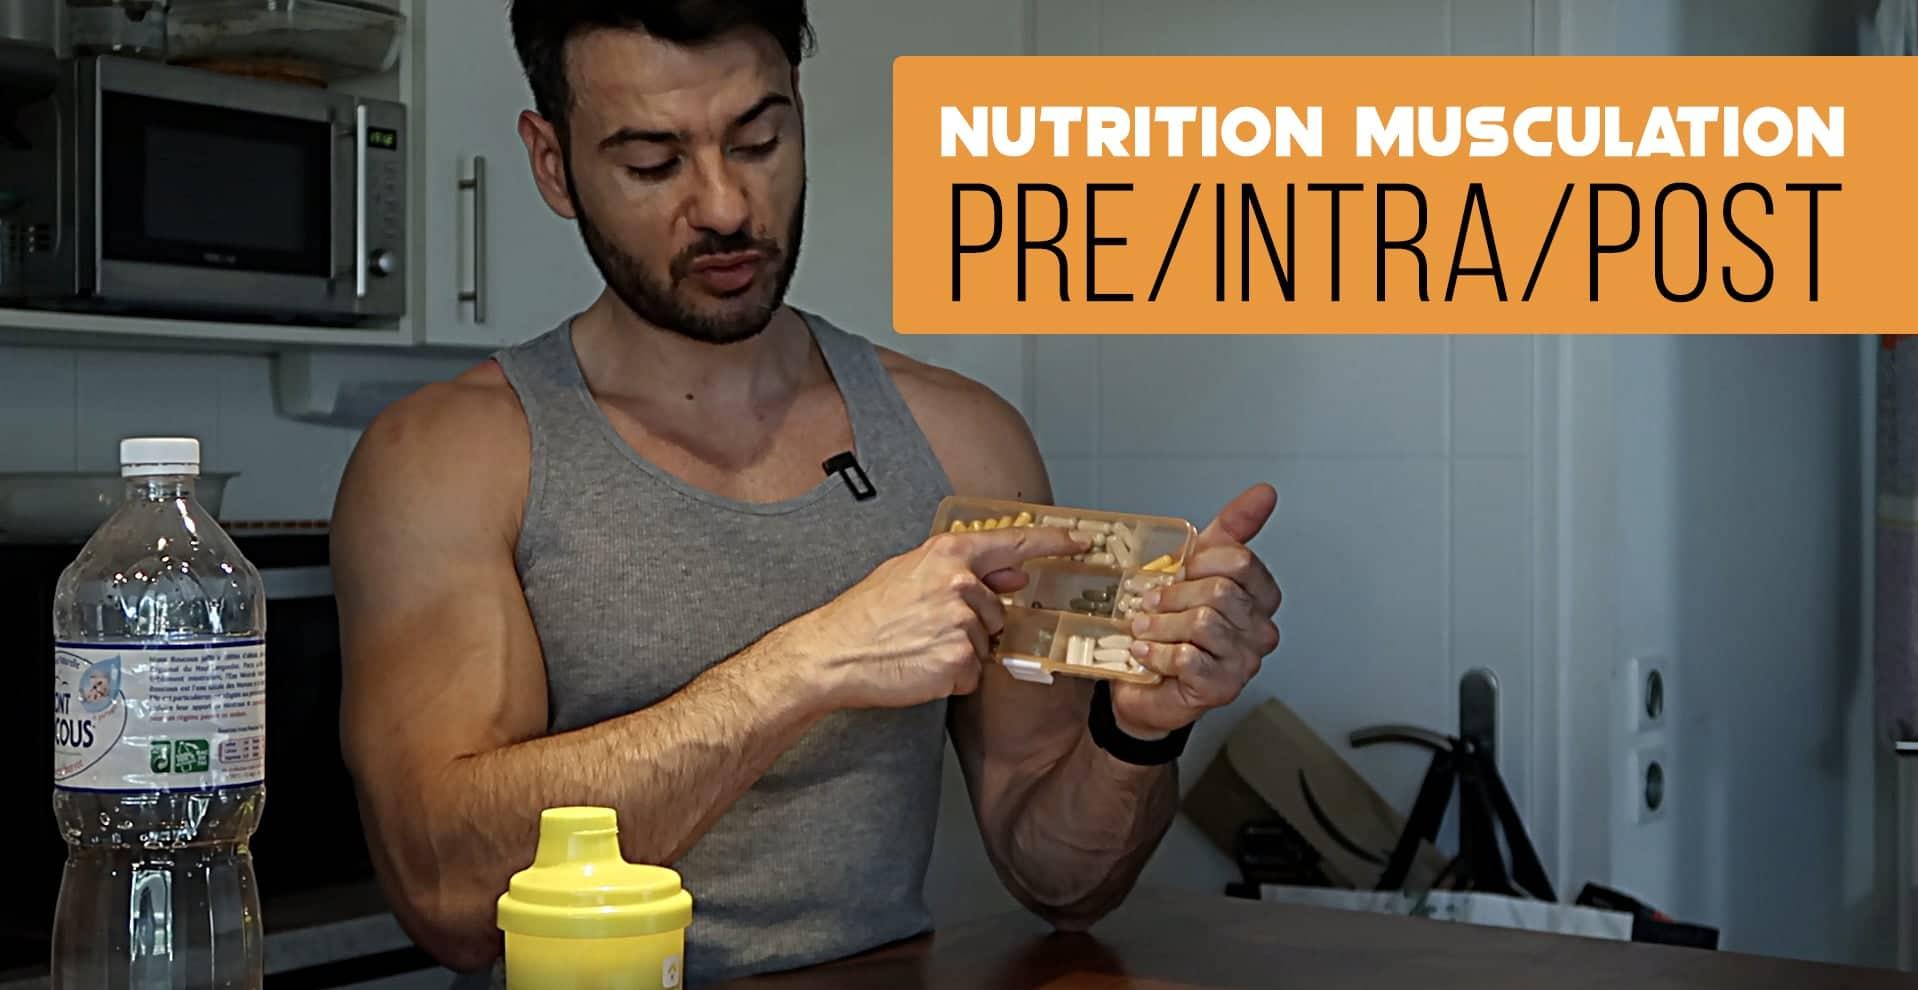 nutrition musculation entrainement